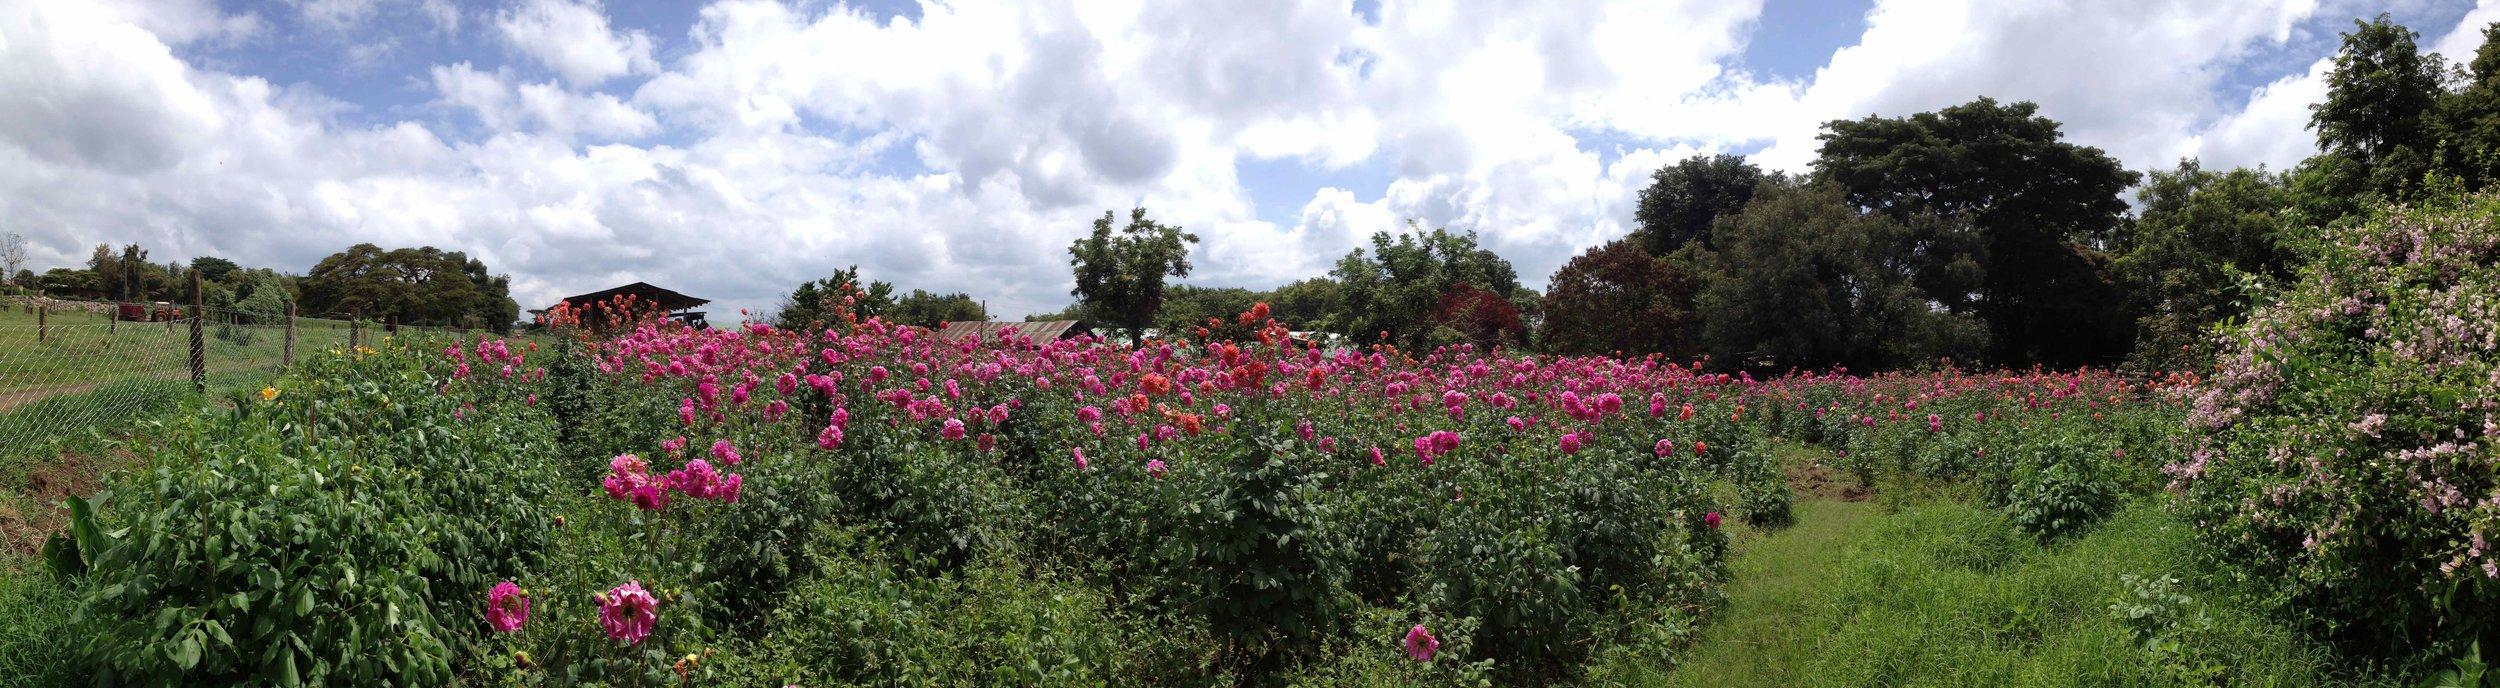 View of the Dahlia field at Kenana Farm, pic by Georgina Cullum in 2014.